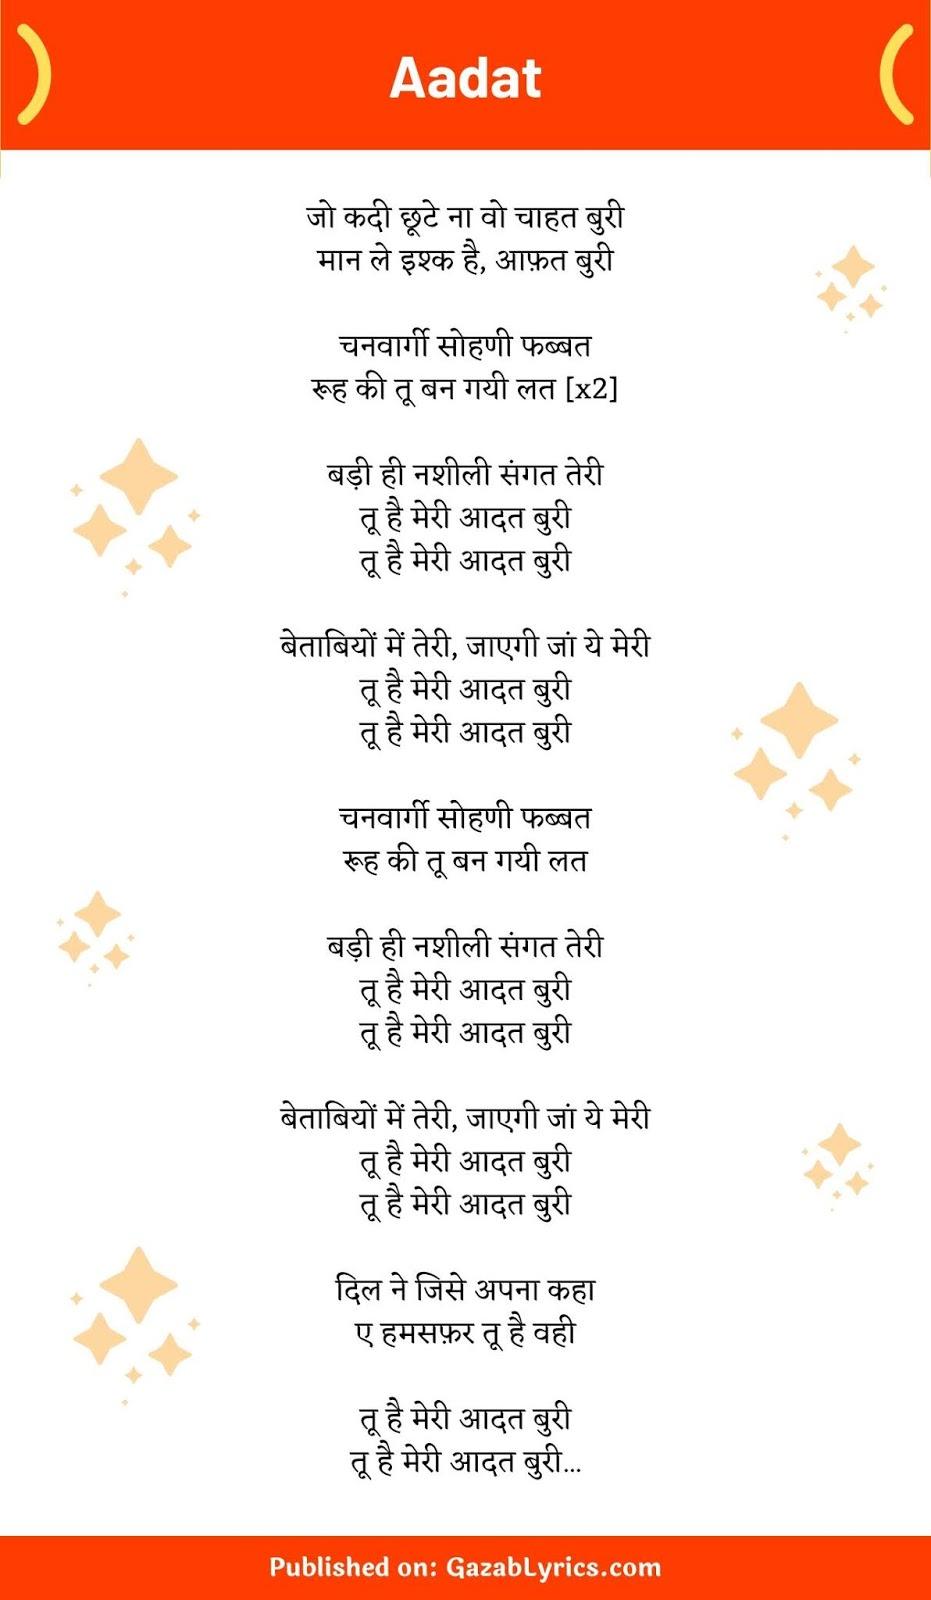 Aadat song lyrics image